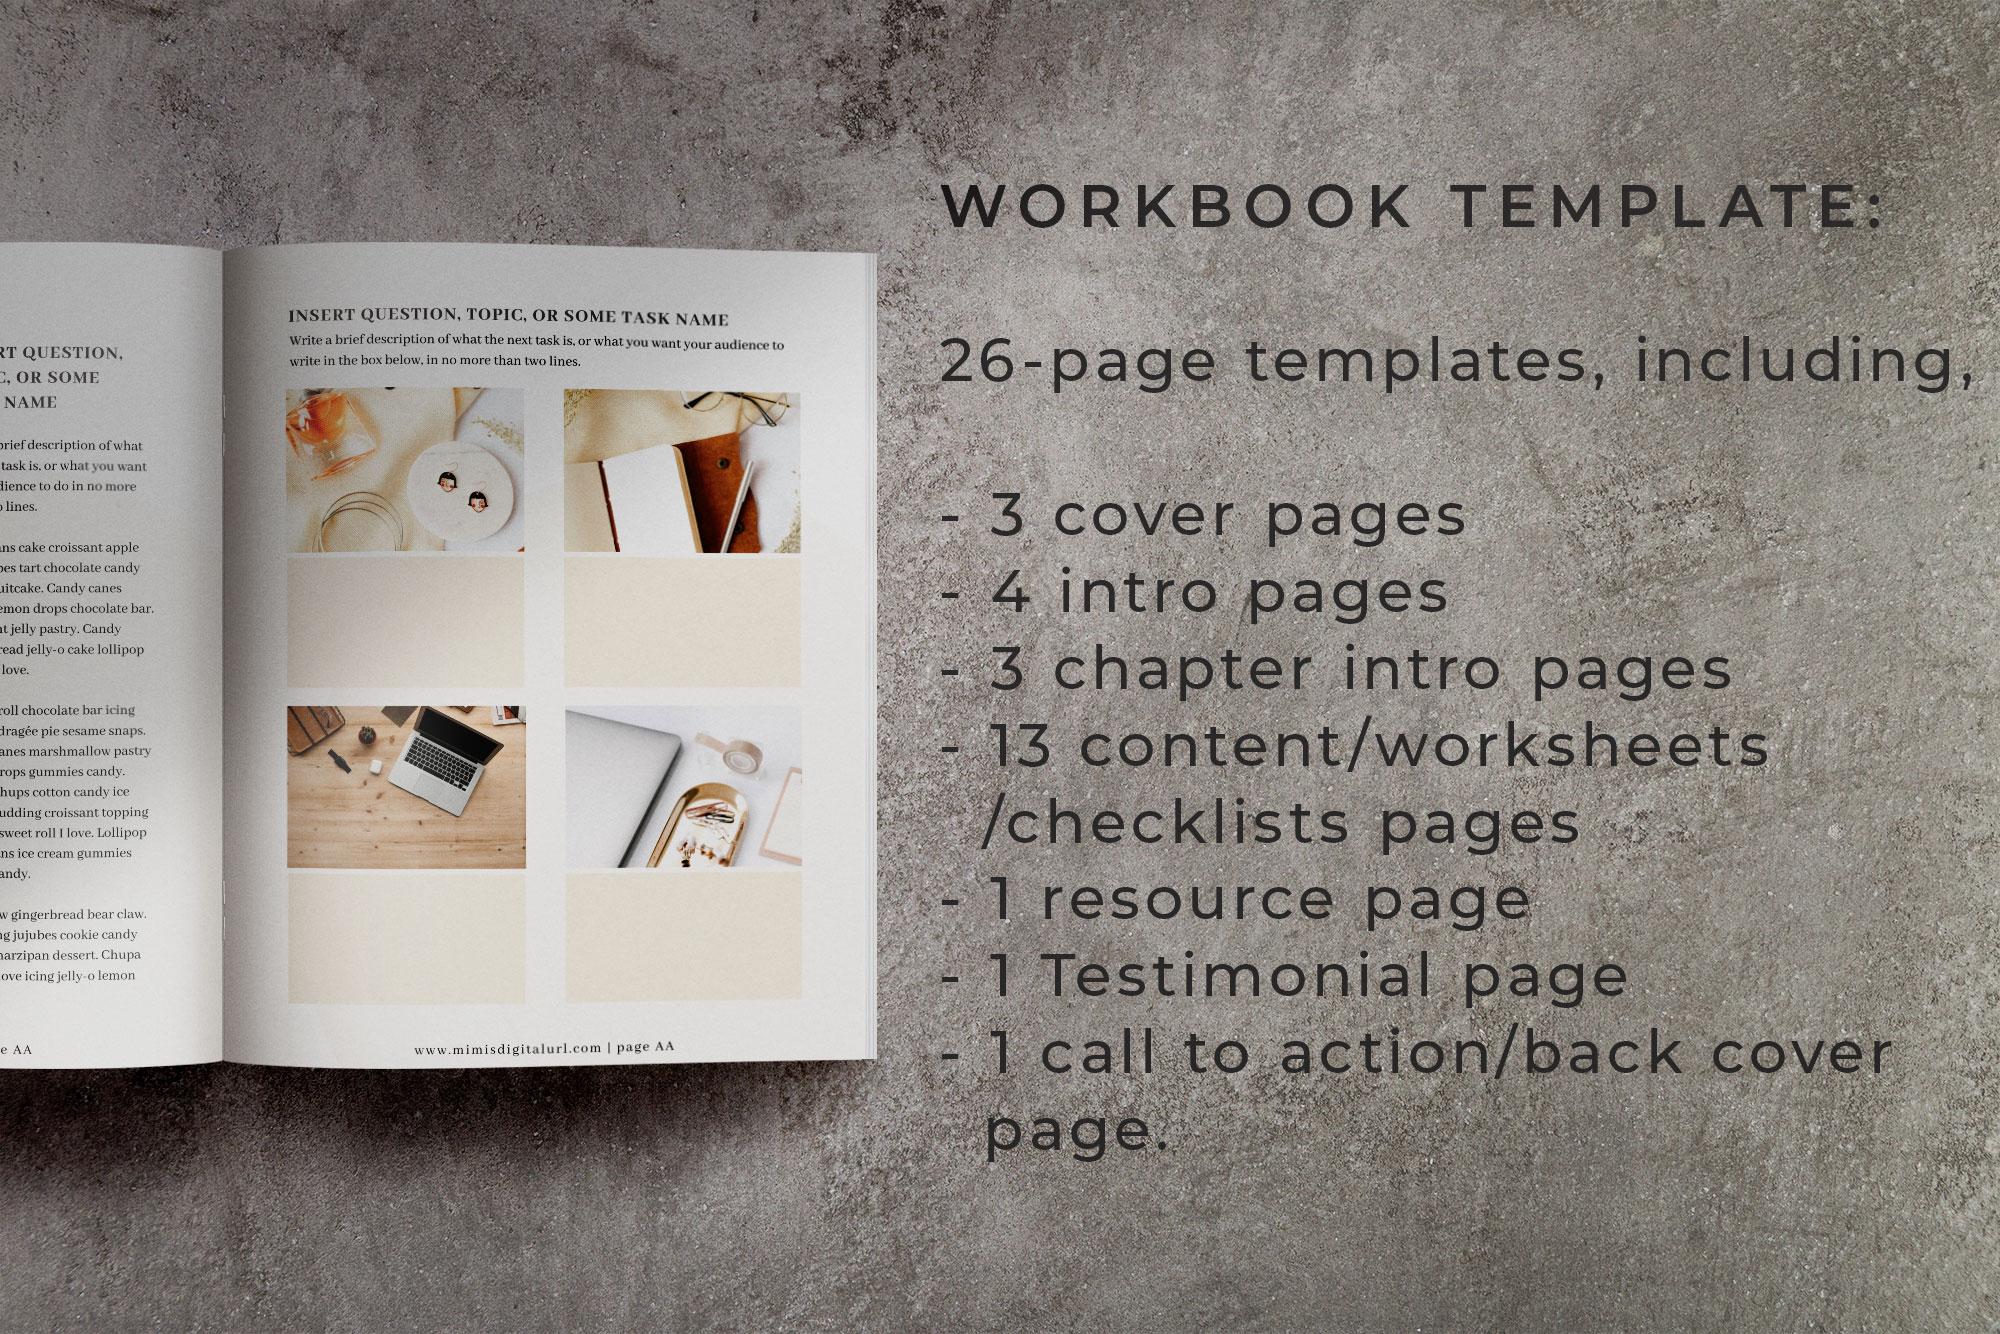 Workbook Canva Template | Mink example image 2